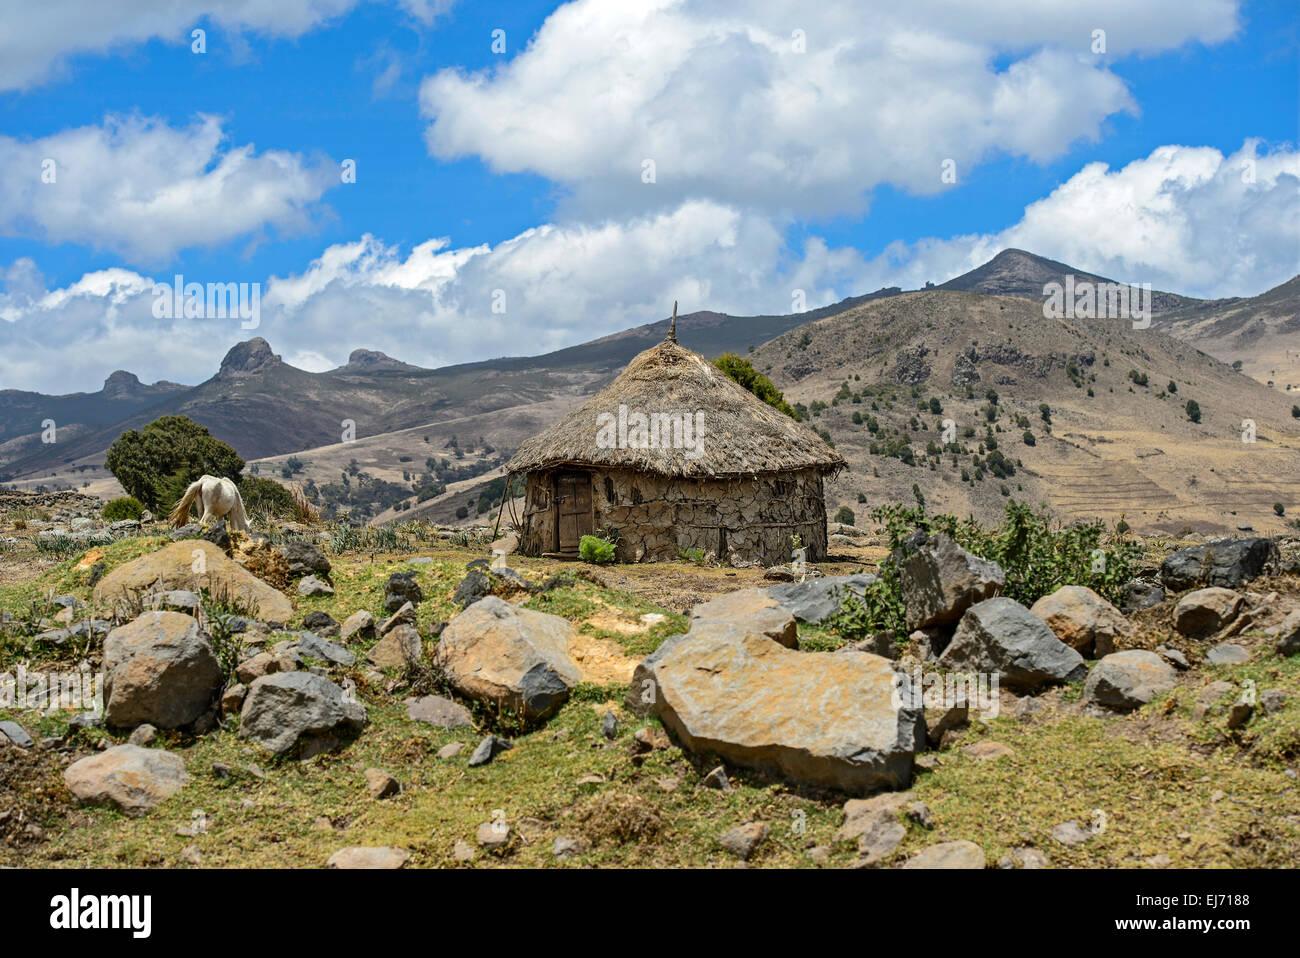 Round Oromo hut with thatched roof in a mountainous landscape of the Ethiopian highland, Bale area, Oromiya, Ethiopia - Stock Image